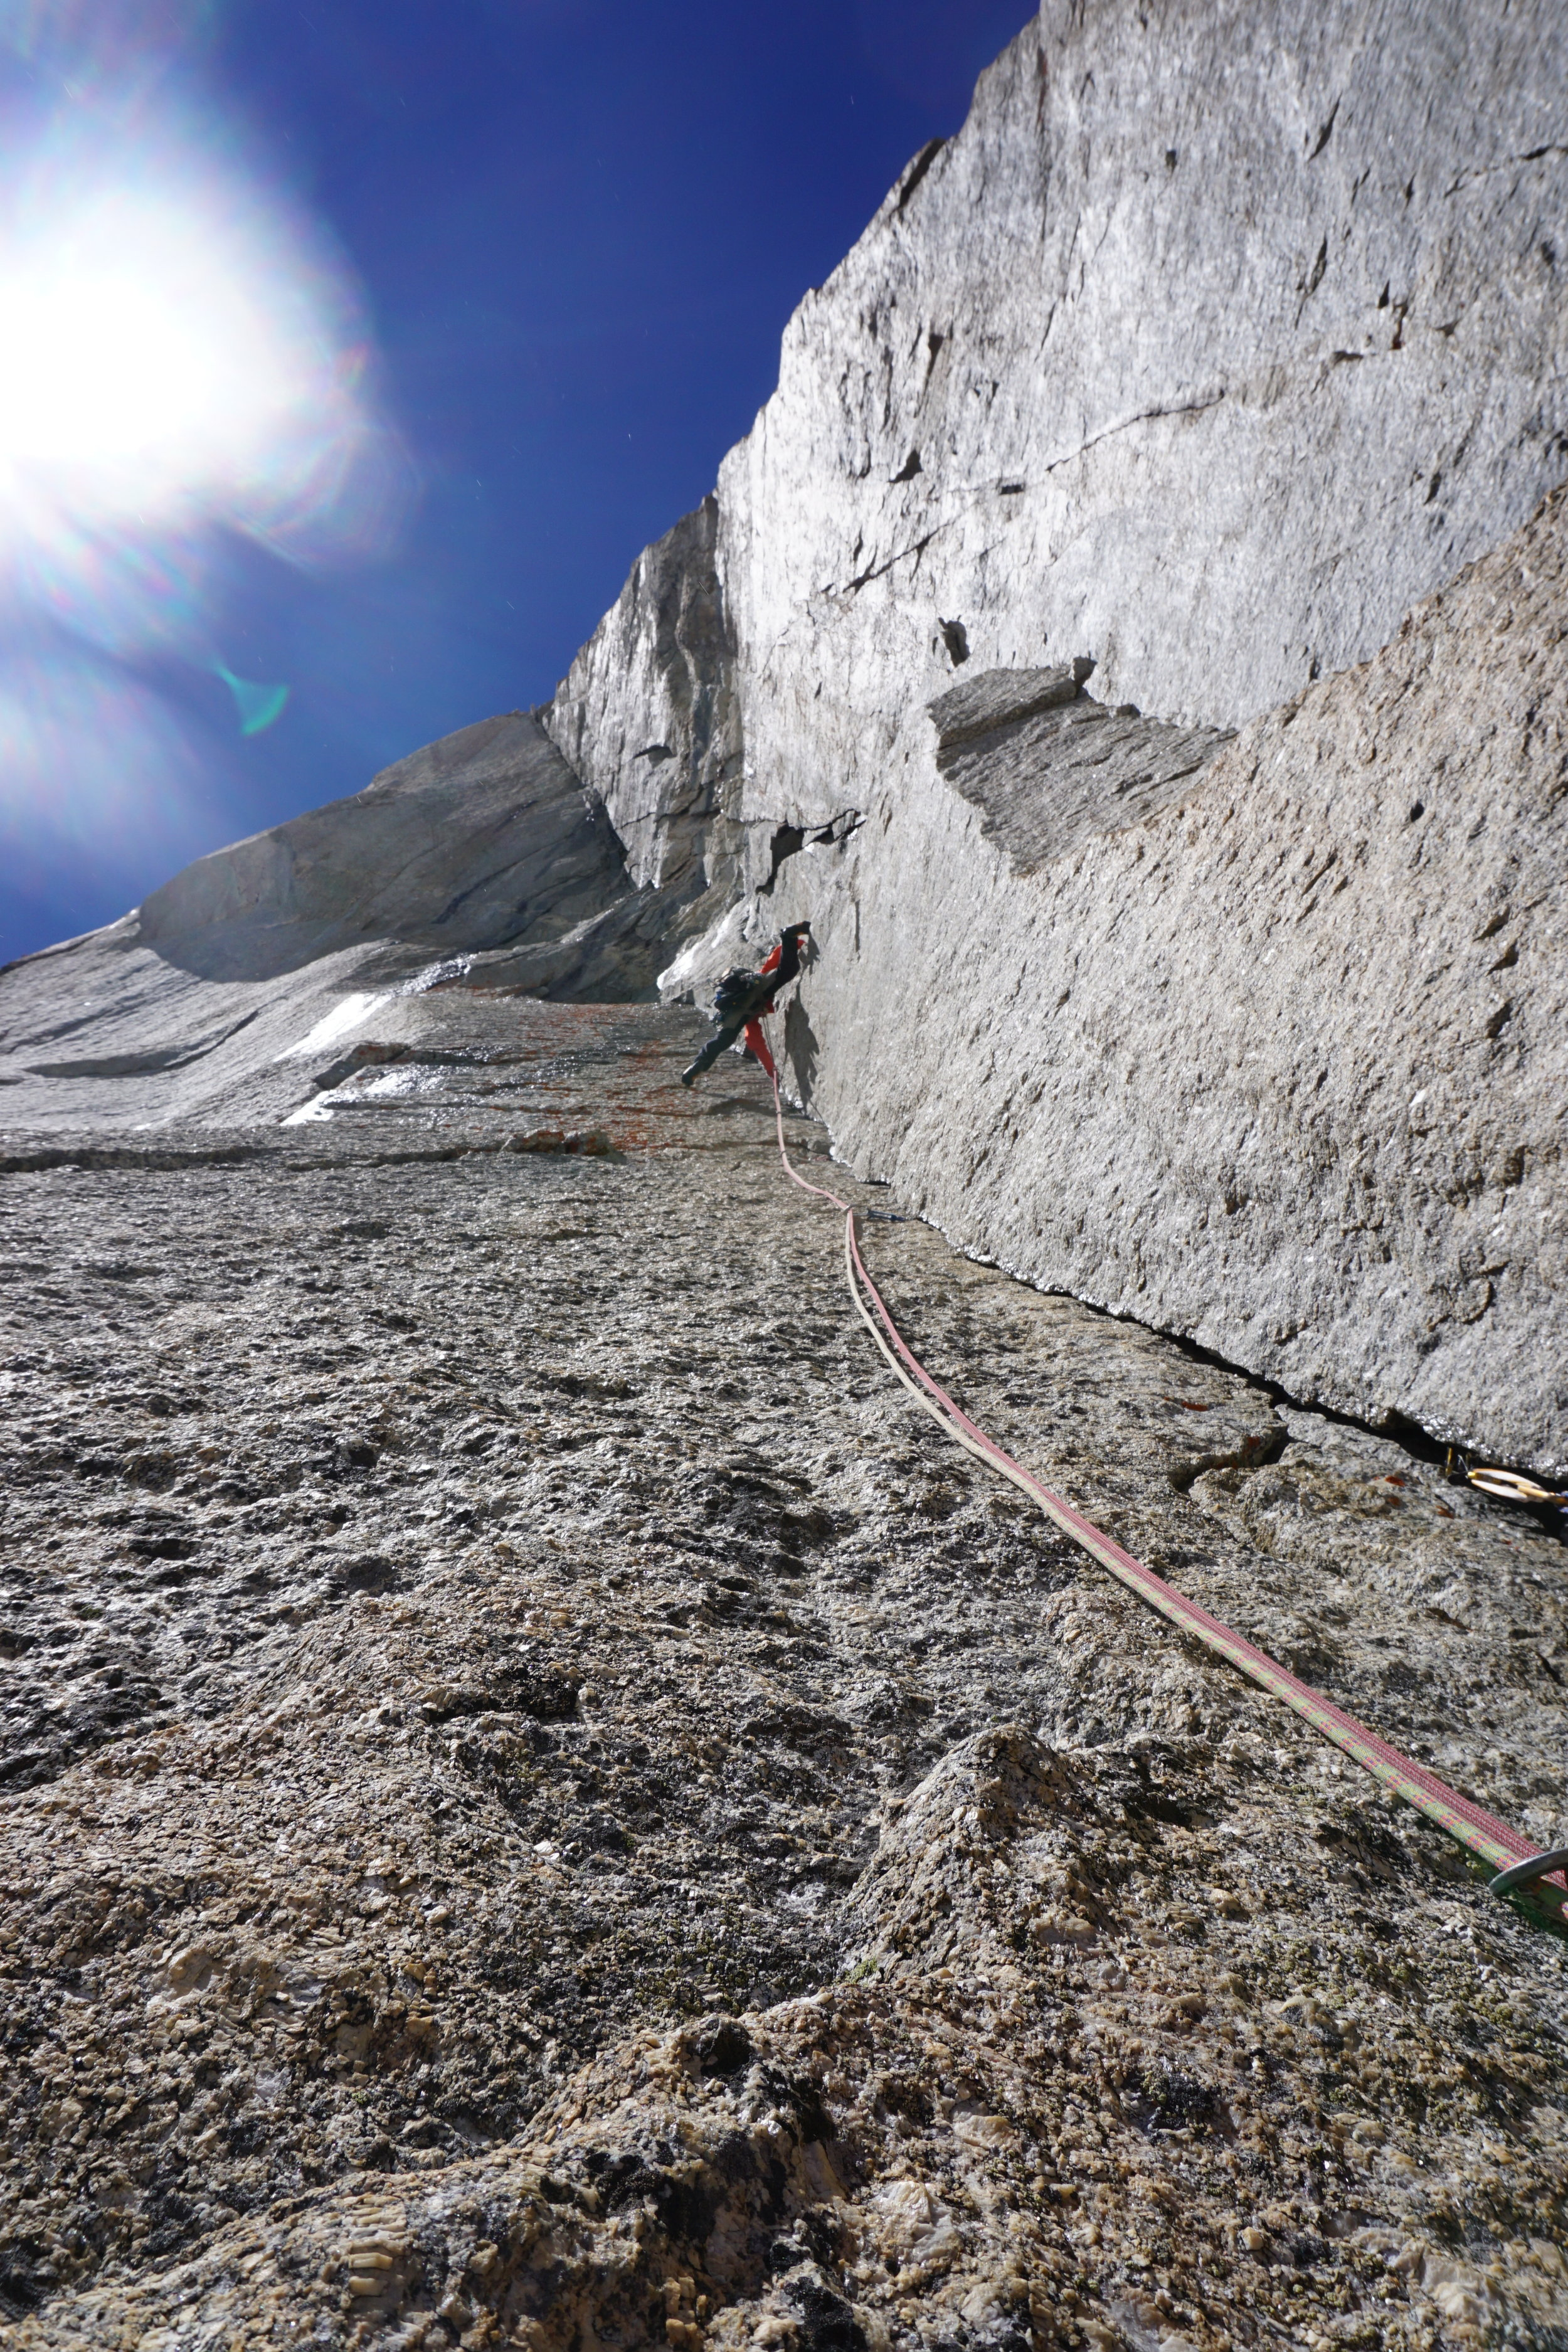 john mccune on divine providence, mont blanc. photo: uisdean hawthorn